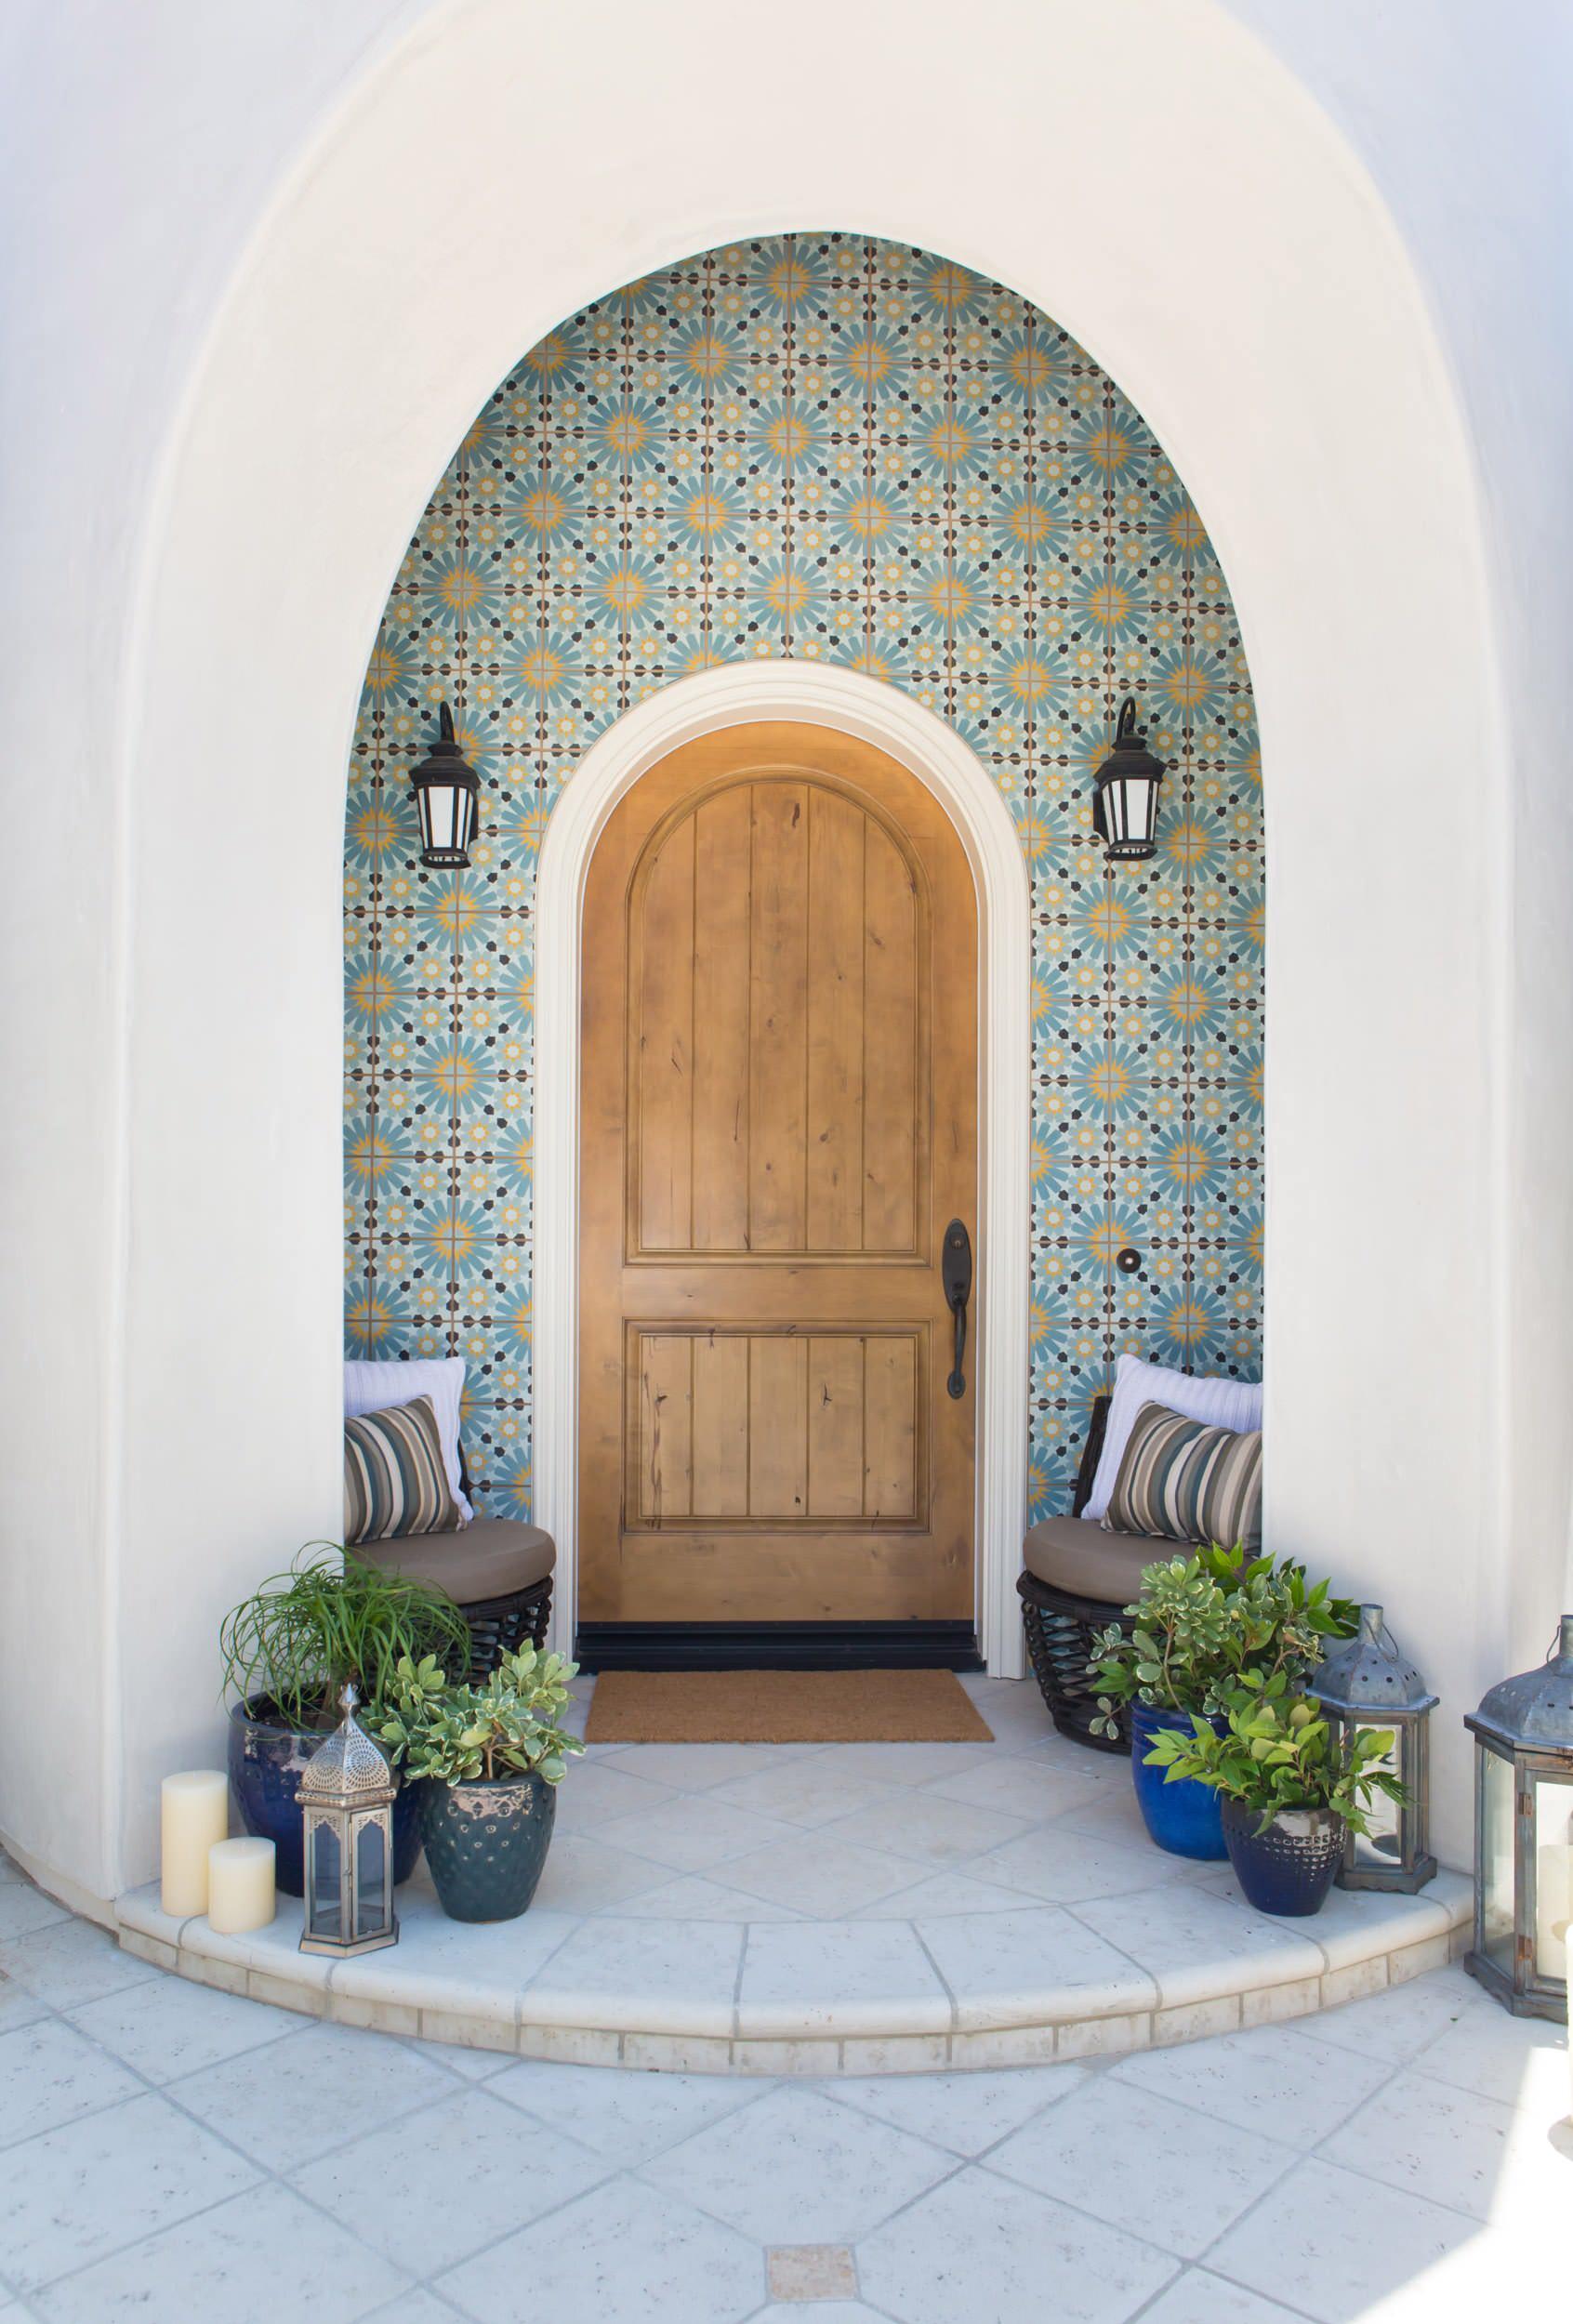 16 Tempting Mediterranean Entrance Designs That Will Stun You